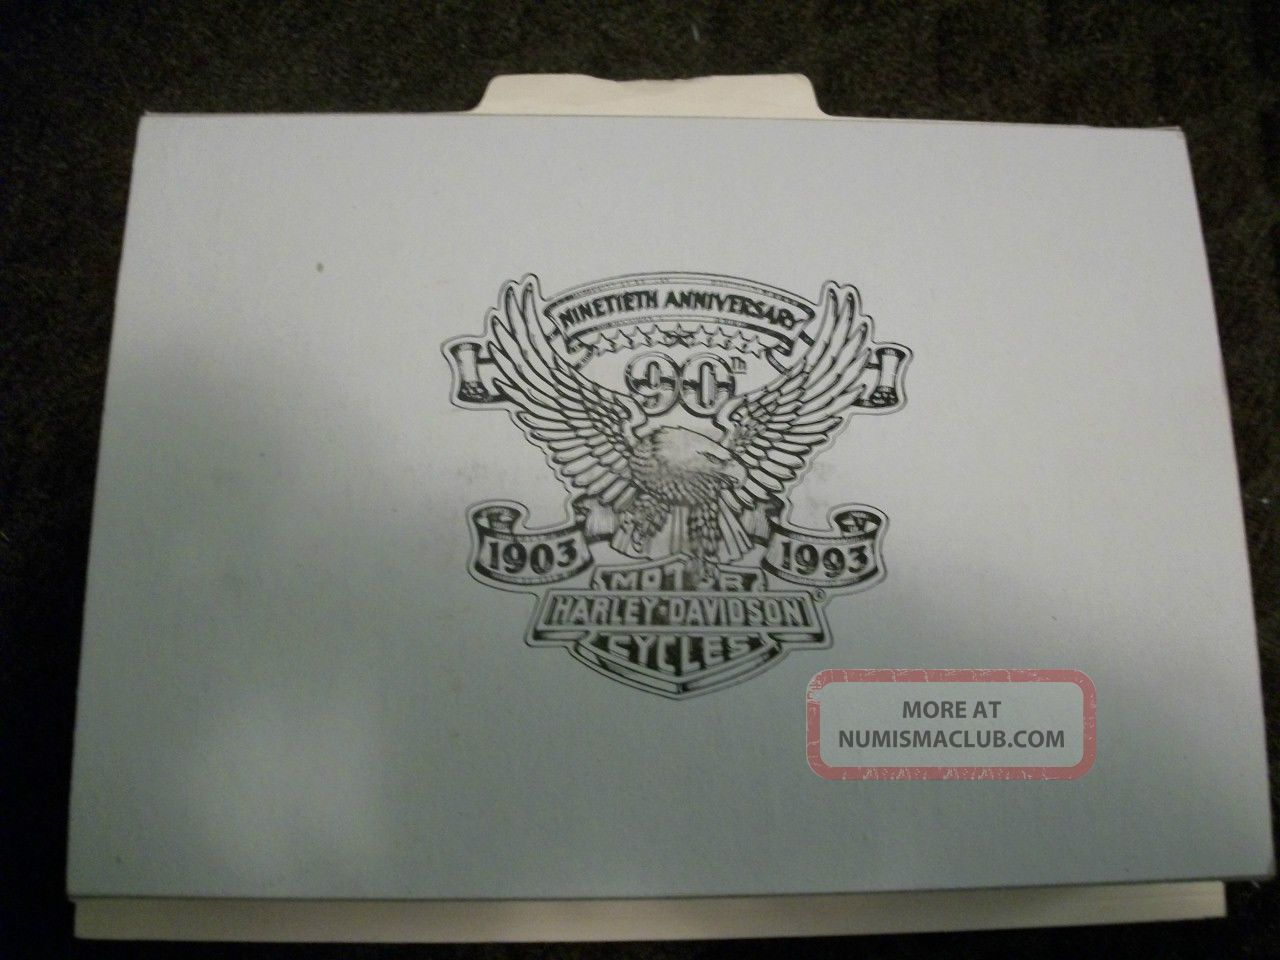 Harley Davidson 1903 1993 90th Anniversary 24 1 4 Ounce